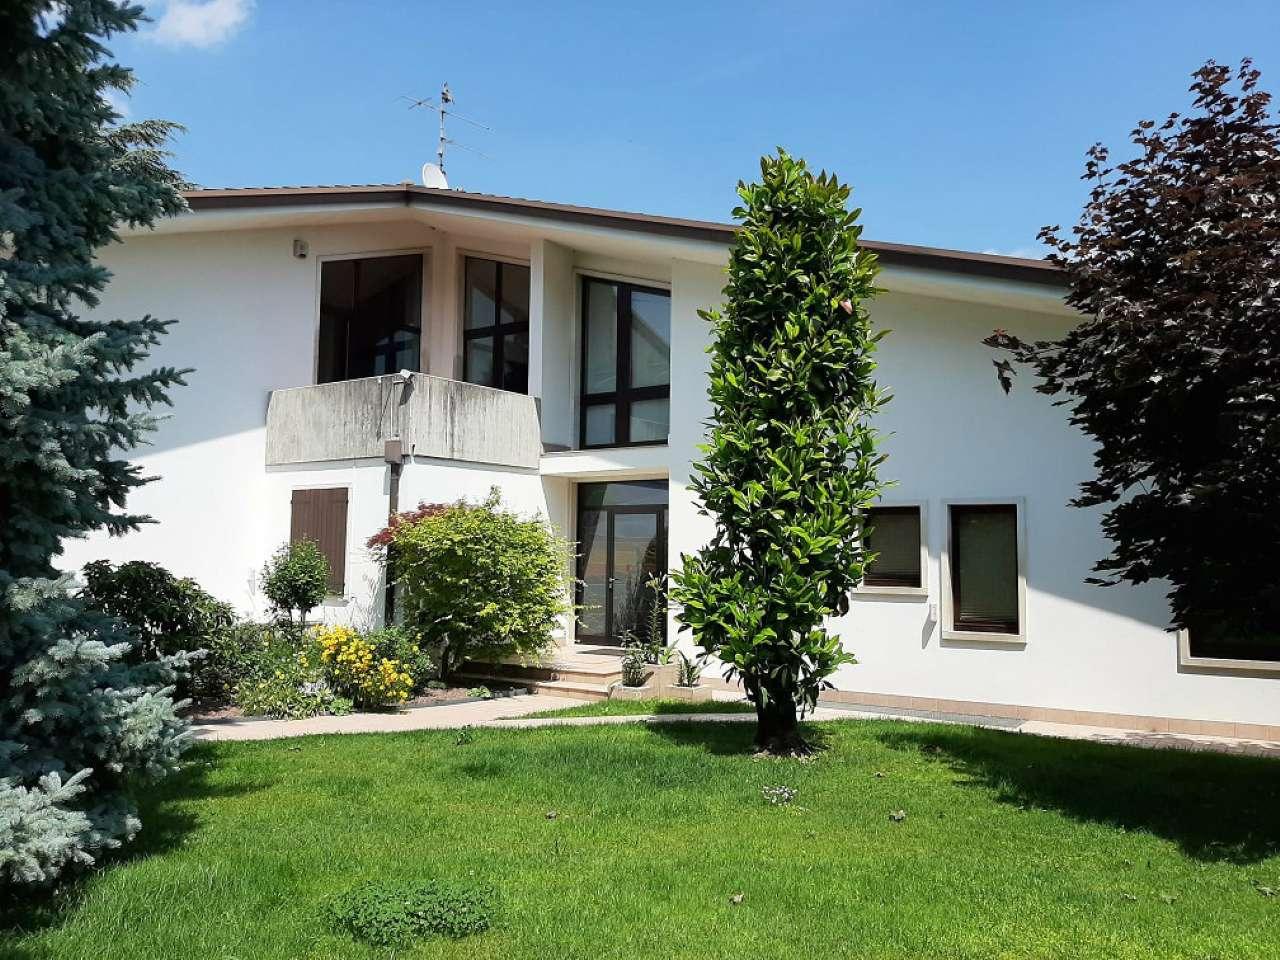 Bussolengo - Villa con giardino, foto 15